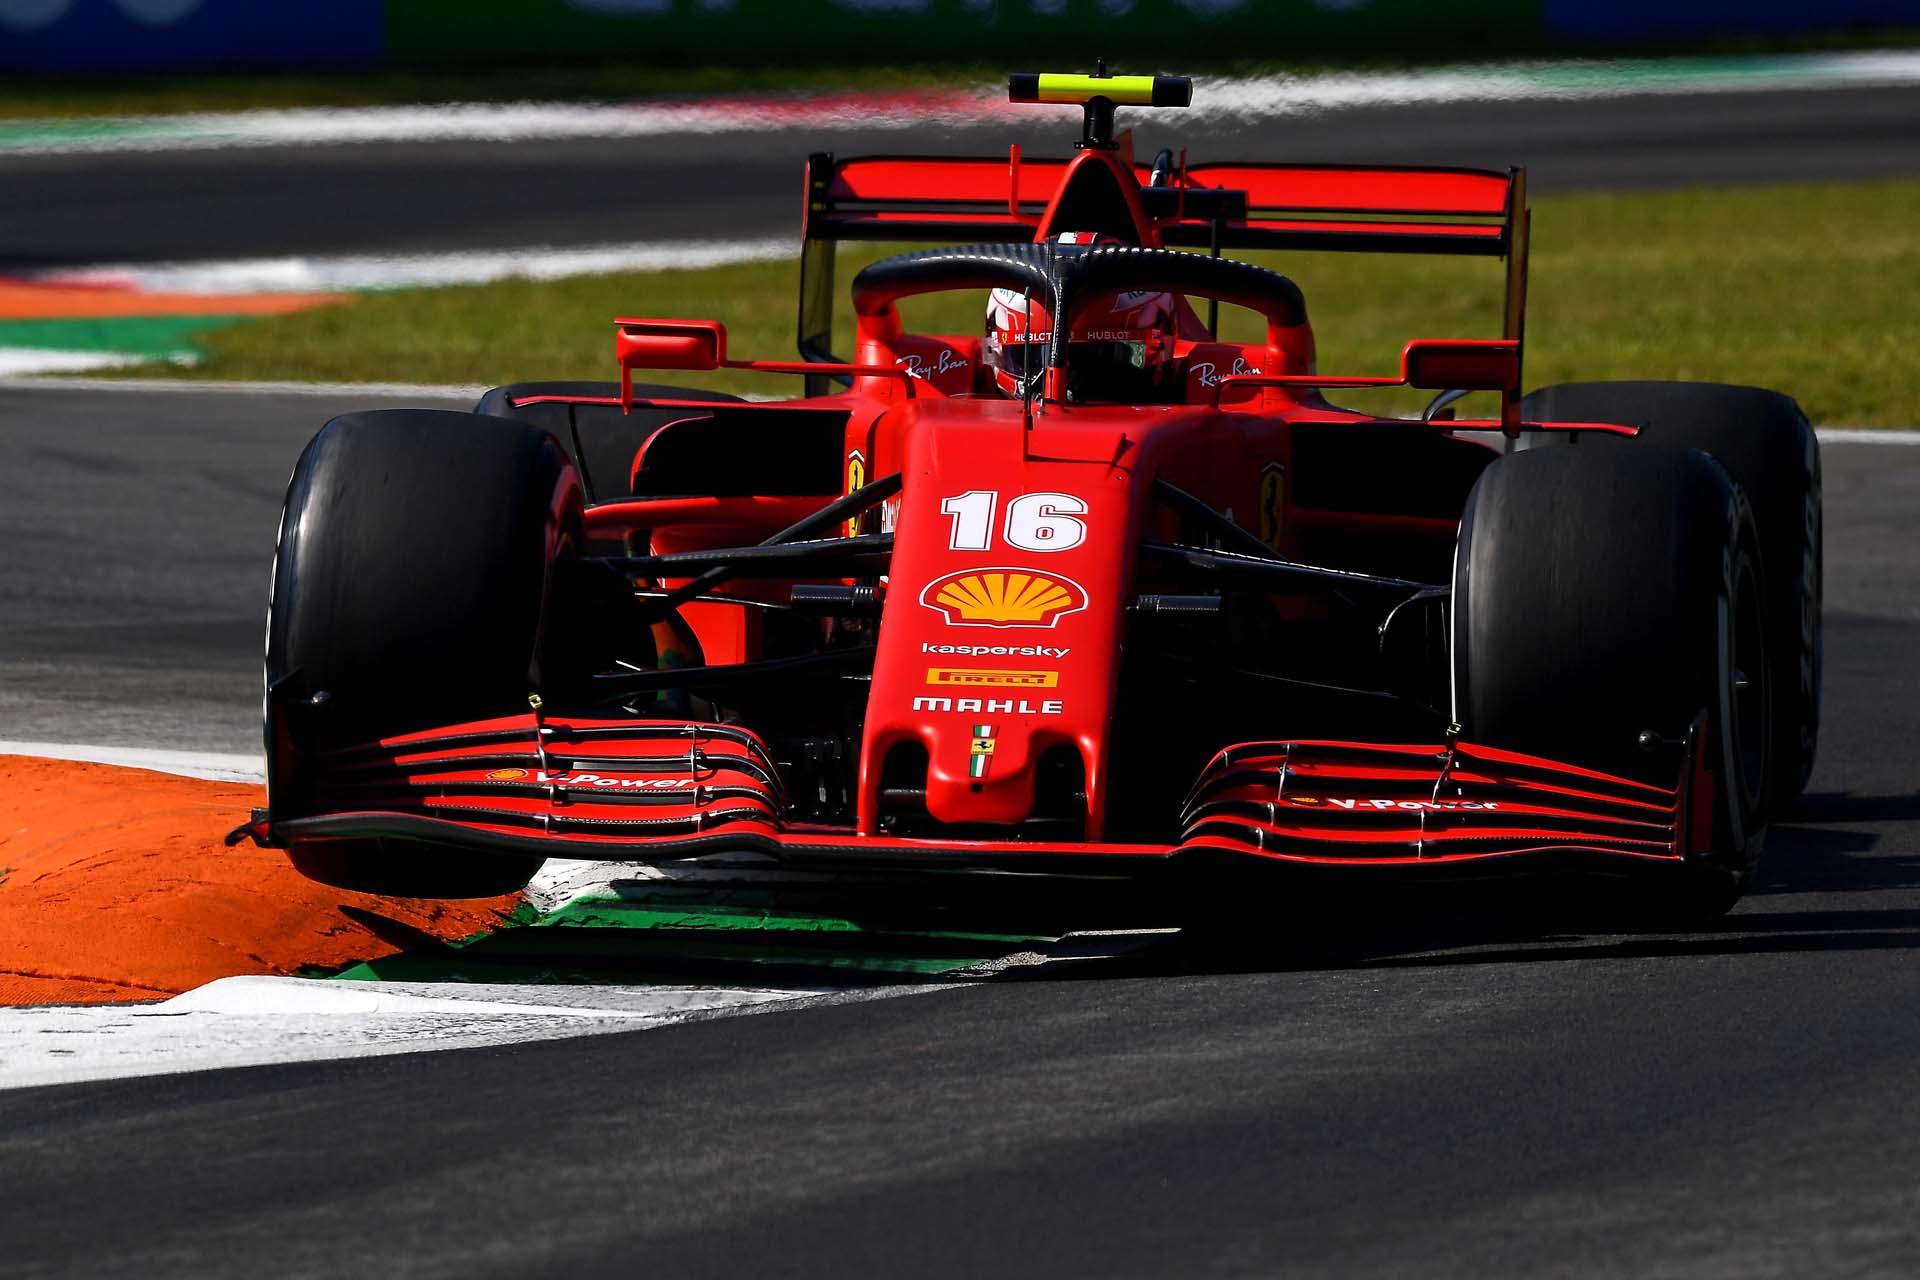 GP ITALIA F1/2020 -  VENERDÌ 04/09/2020